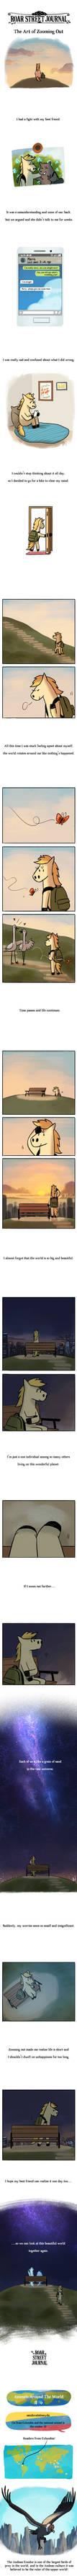 [RSJ webtoon] The Art of Zooming Out